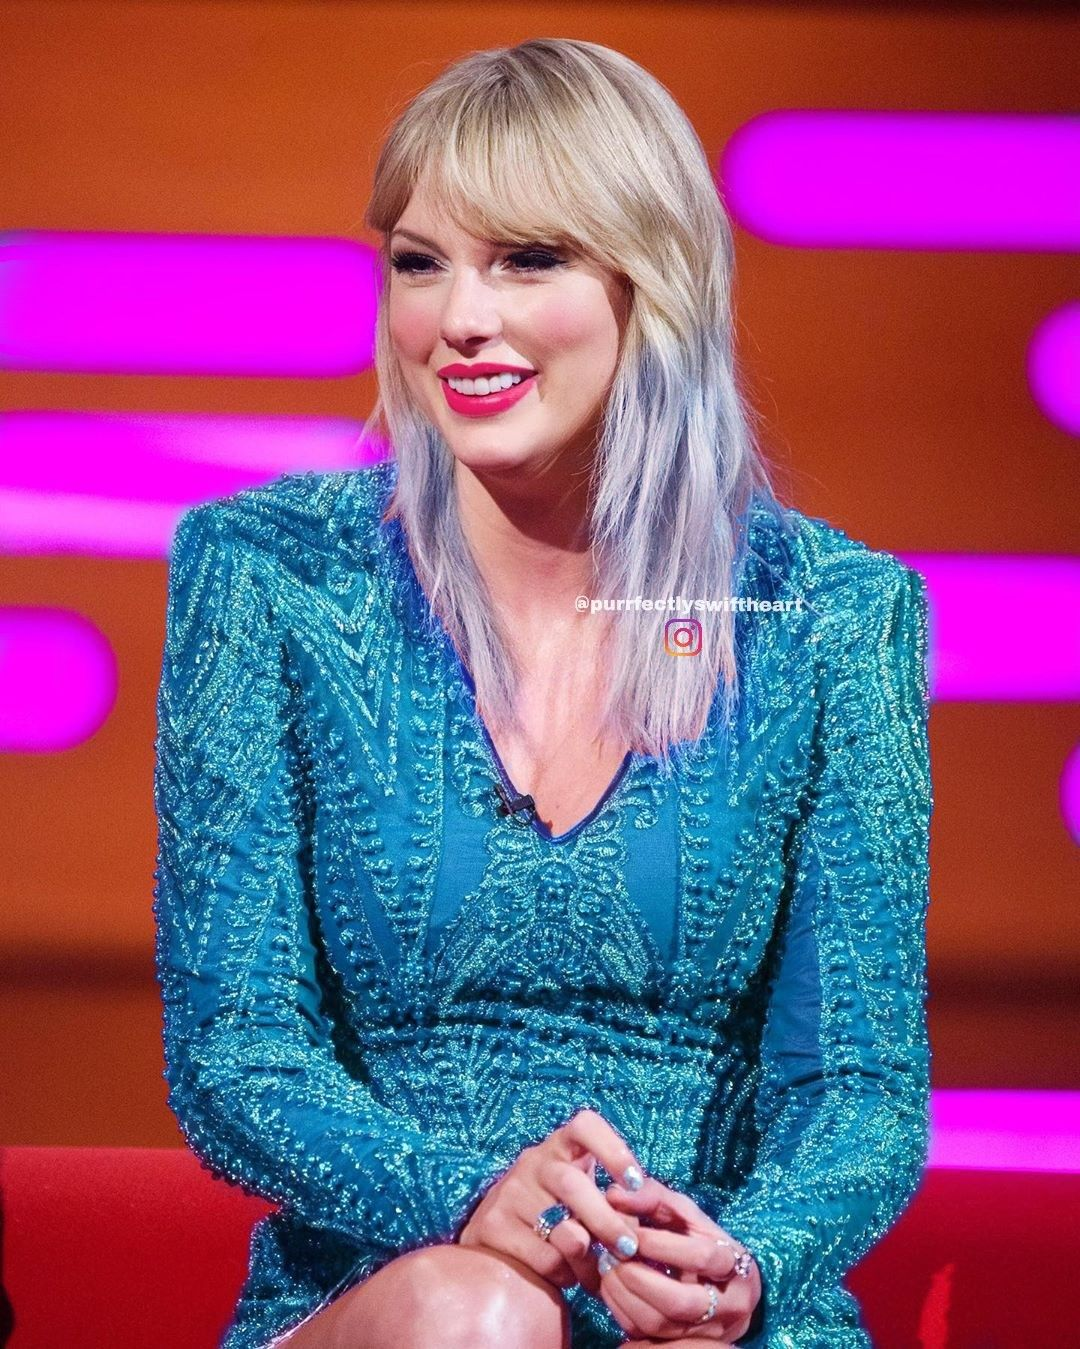 Blue hair, blue dress Taylor swift style, Taylor swift